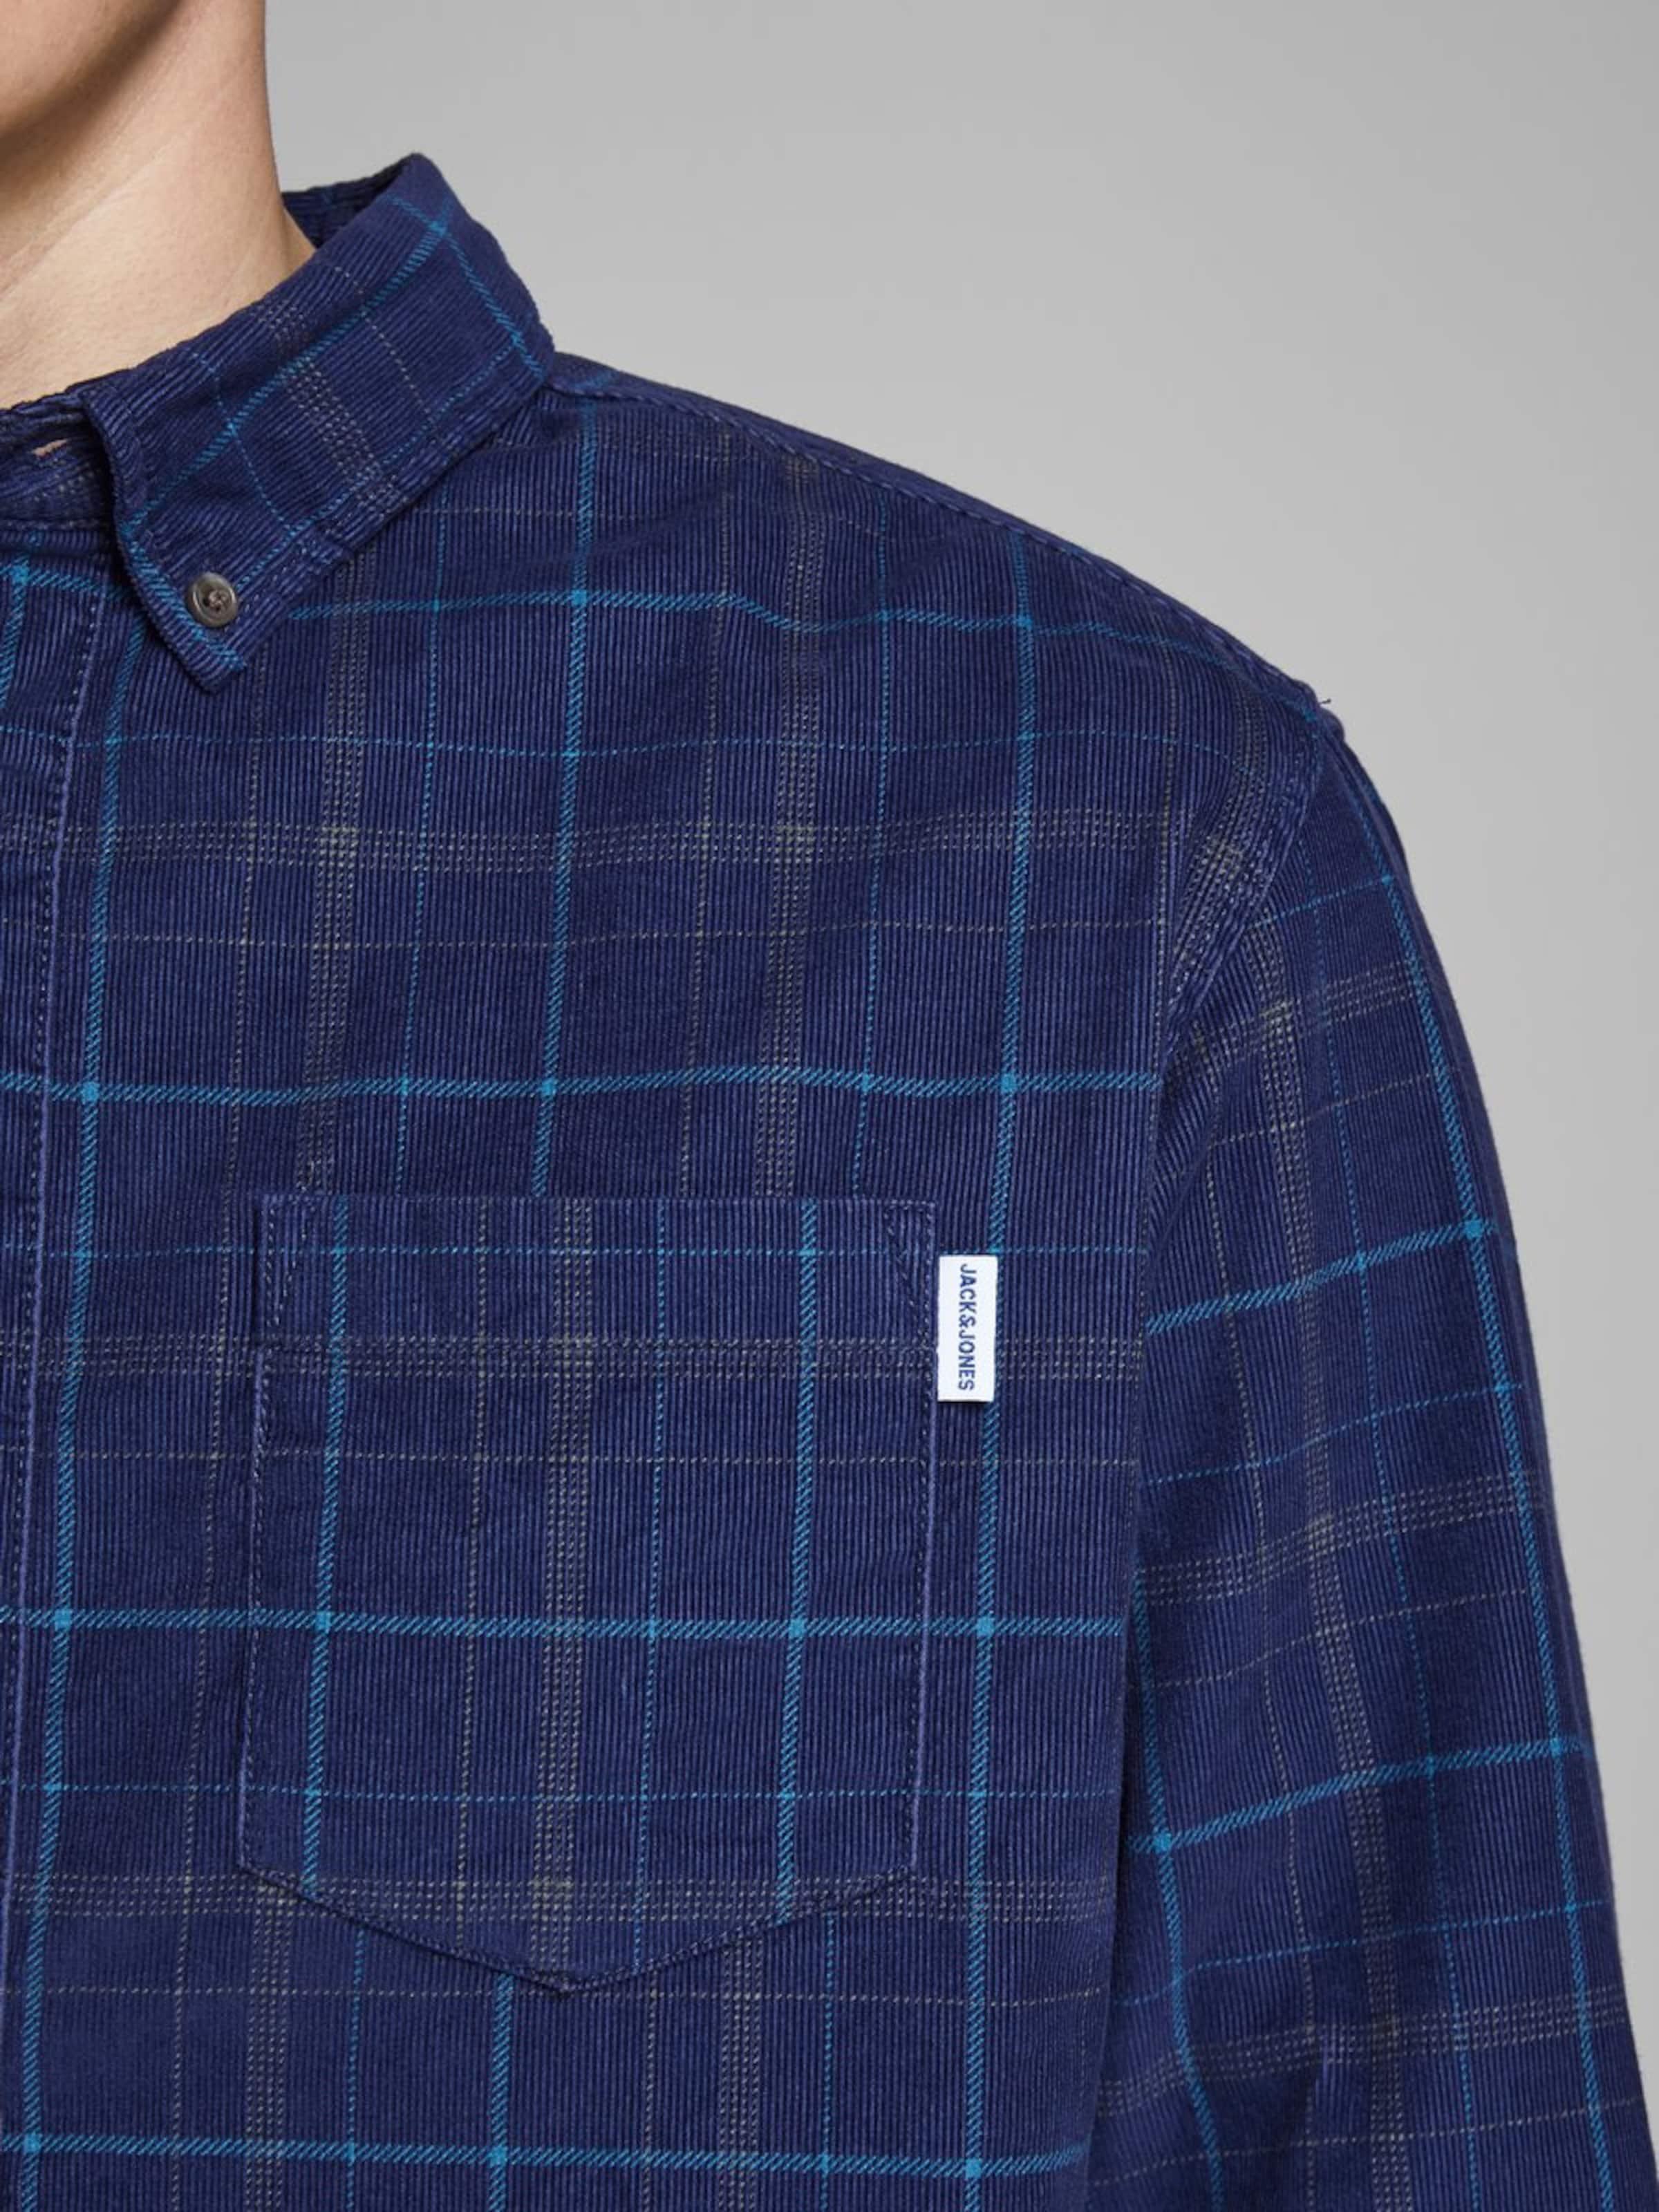 Jones In Jackamp; Hemd Blau 45A3jLqcRS